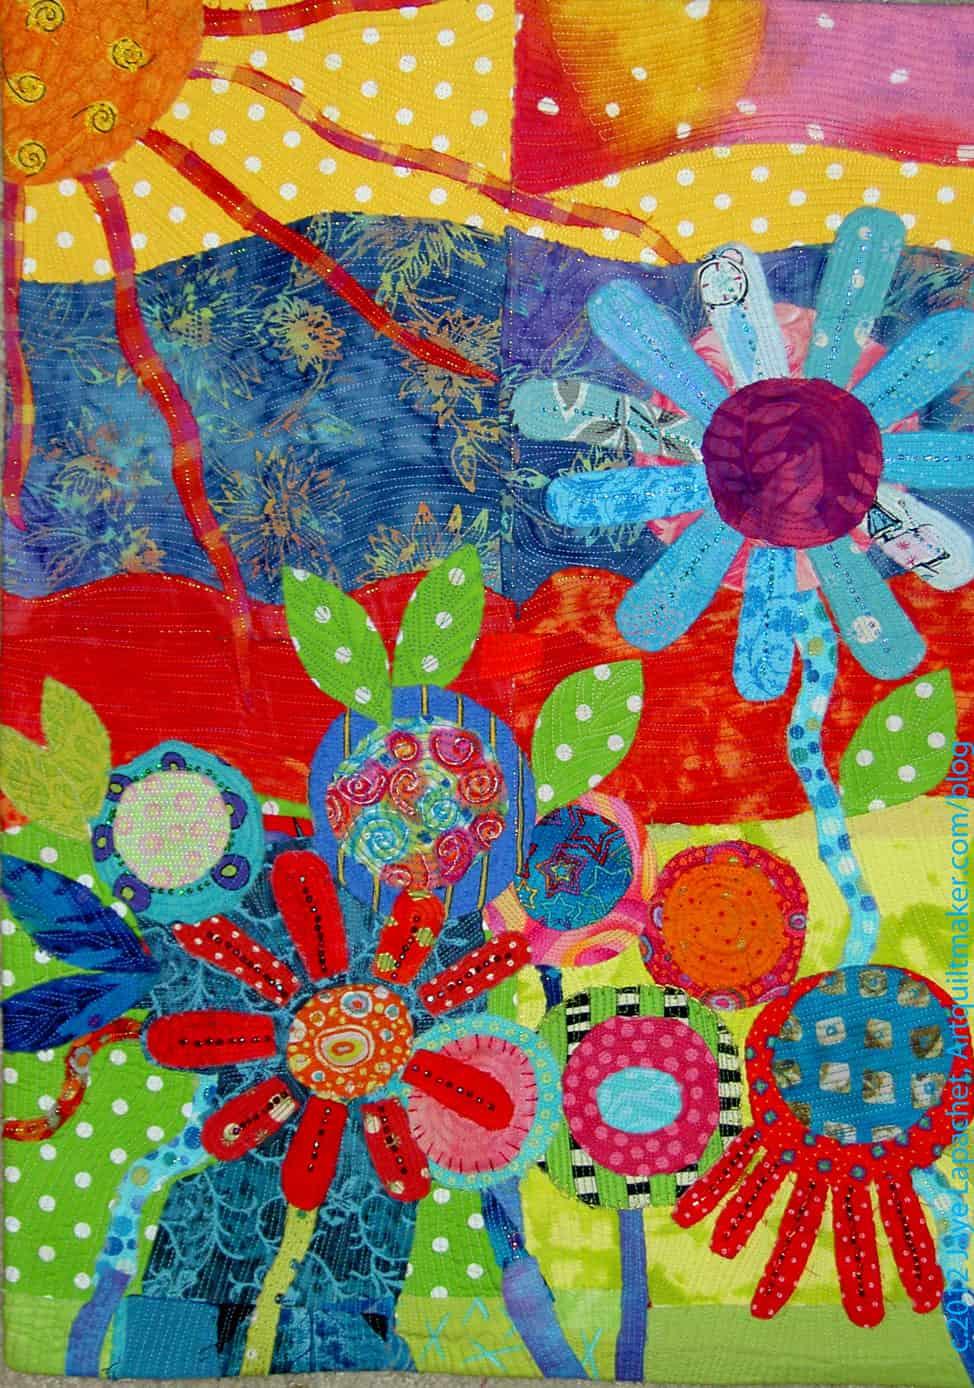 Pamela Allen Style Quilts Artquiltmaker Blog